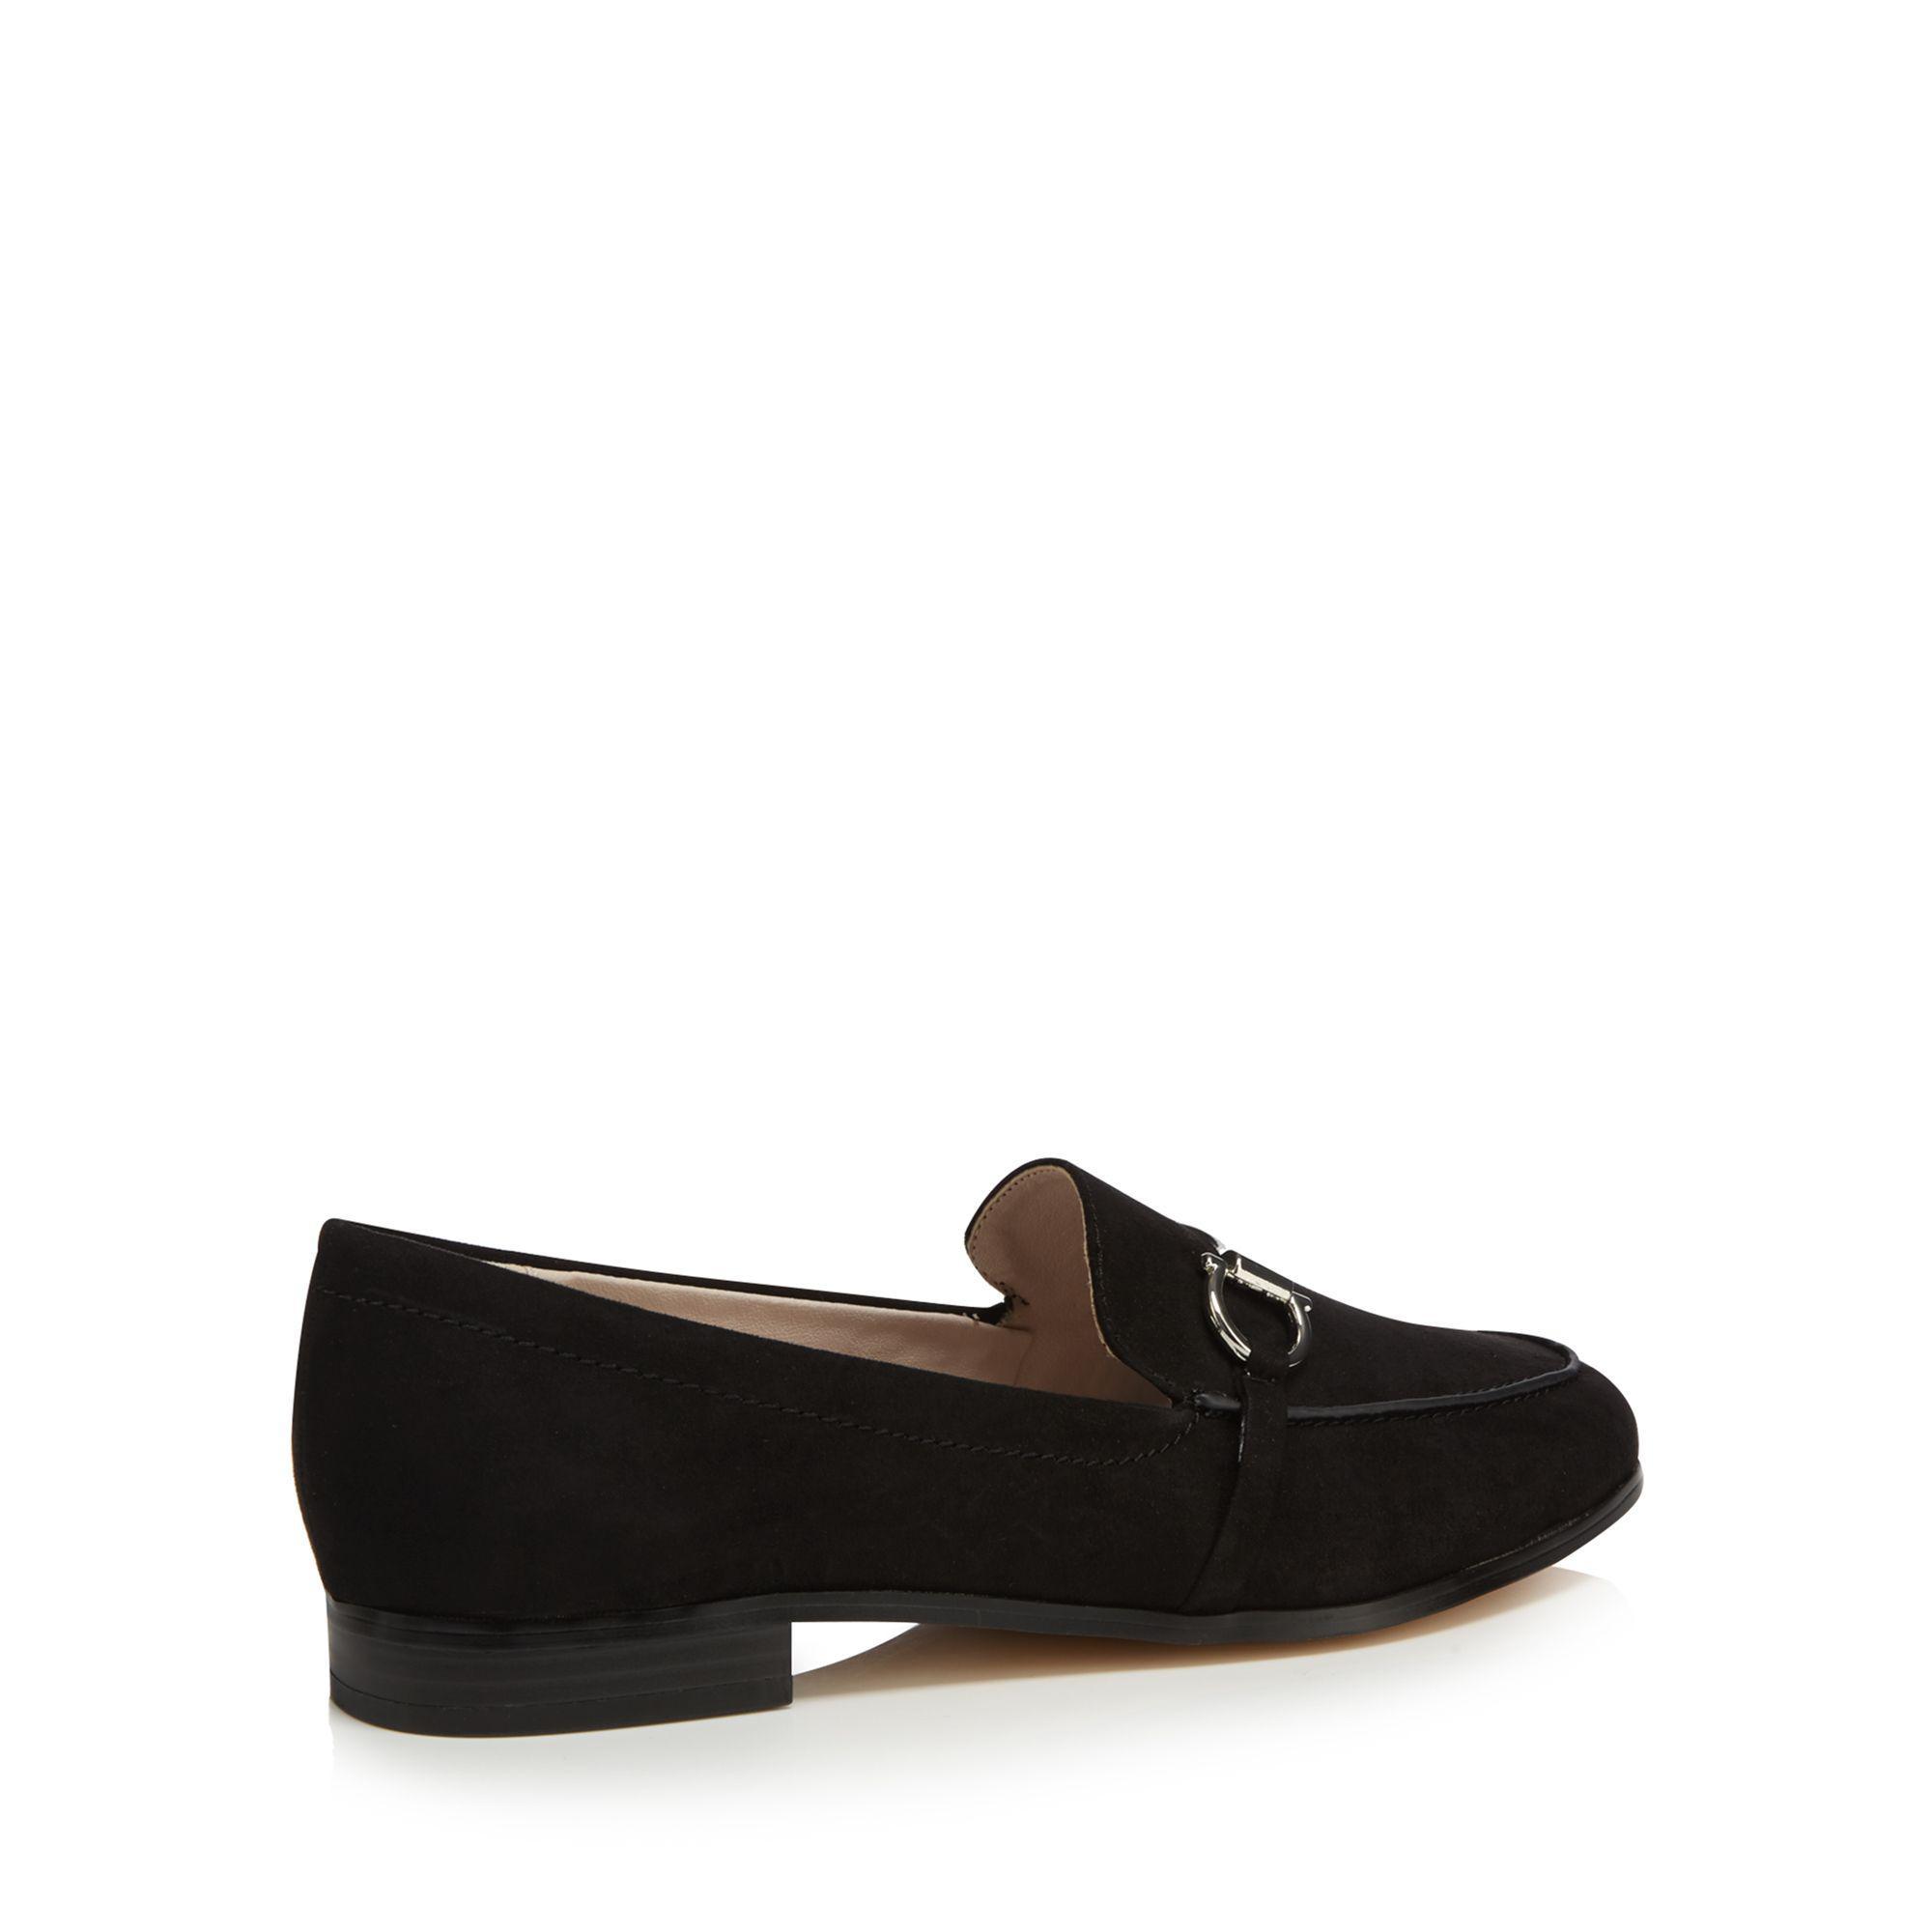 c79c7c98c16 Faith Black Suedette  agnes  Wide Fit Loafers in Black - Lyst